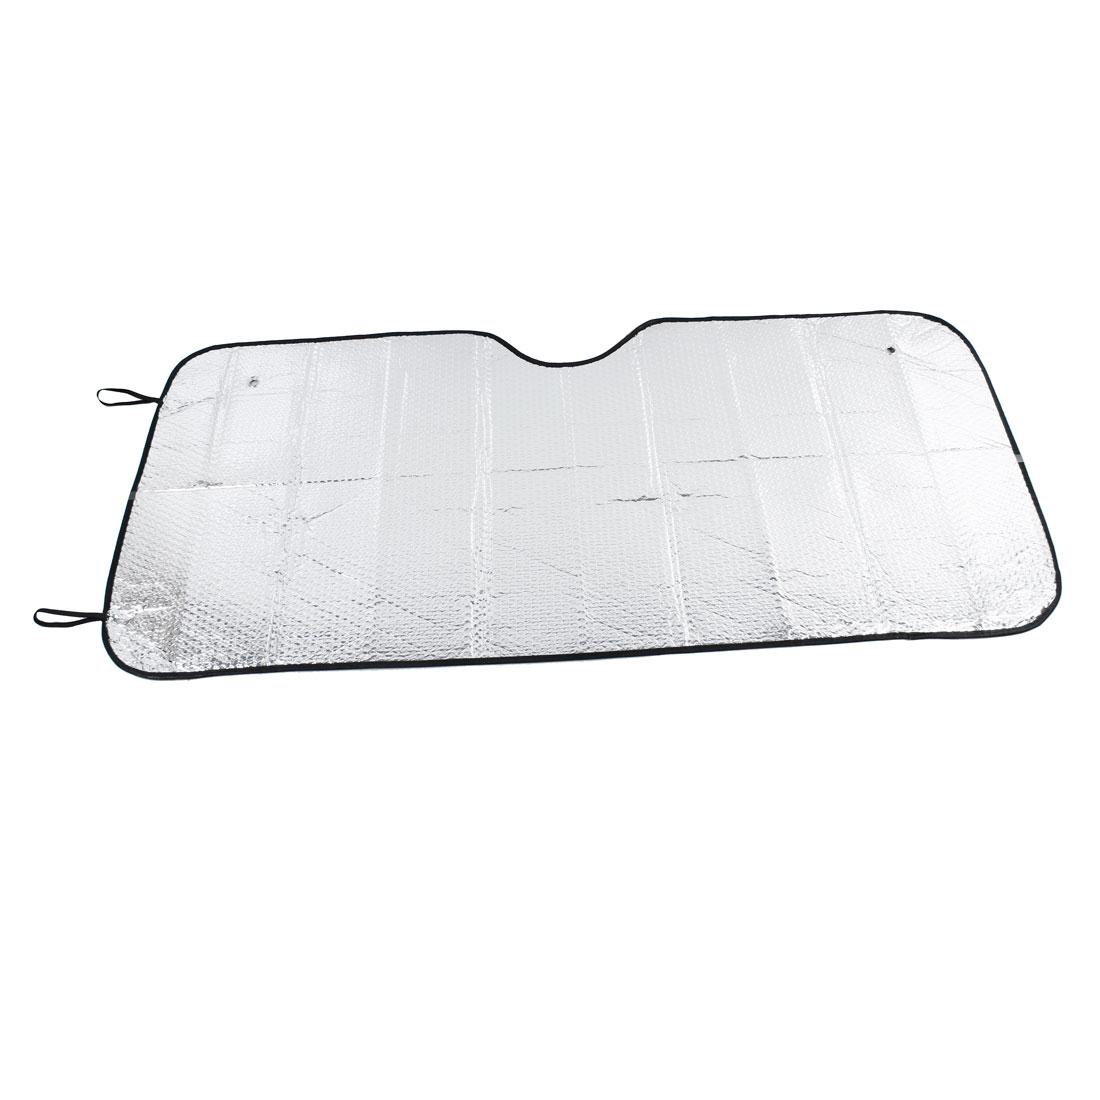 Foldable Silver Tone Aluminium Foil Exterior Car Side Sunshade Sun Visor Shield